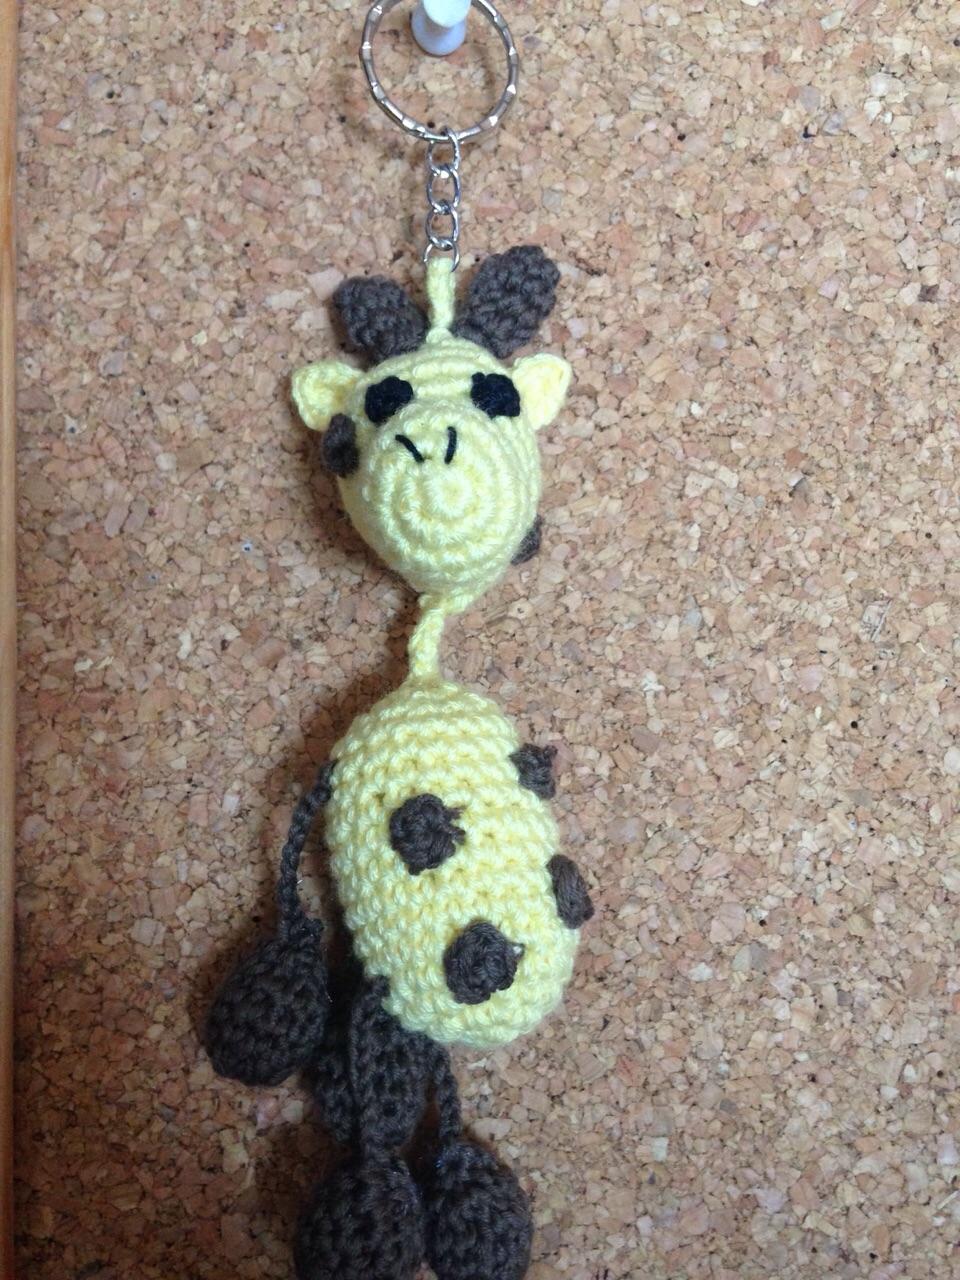 Amigurumi | como hacer una jirafa en crochet | Bibi Crochet - YouTube | 1280x960